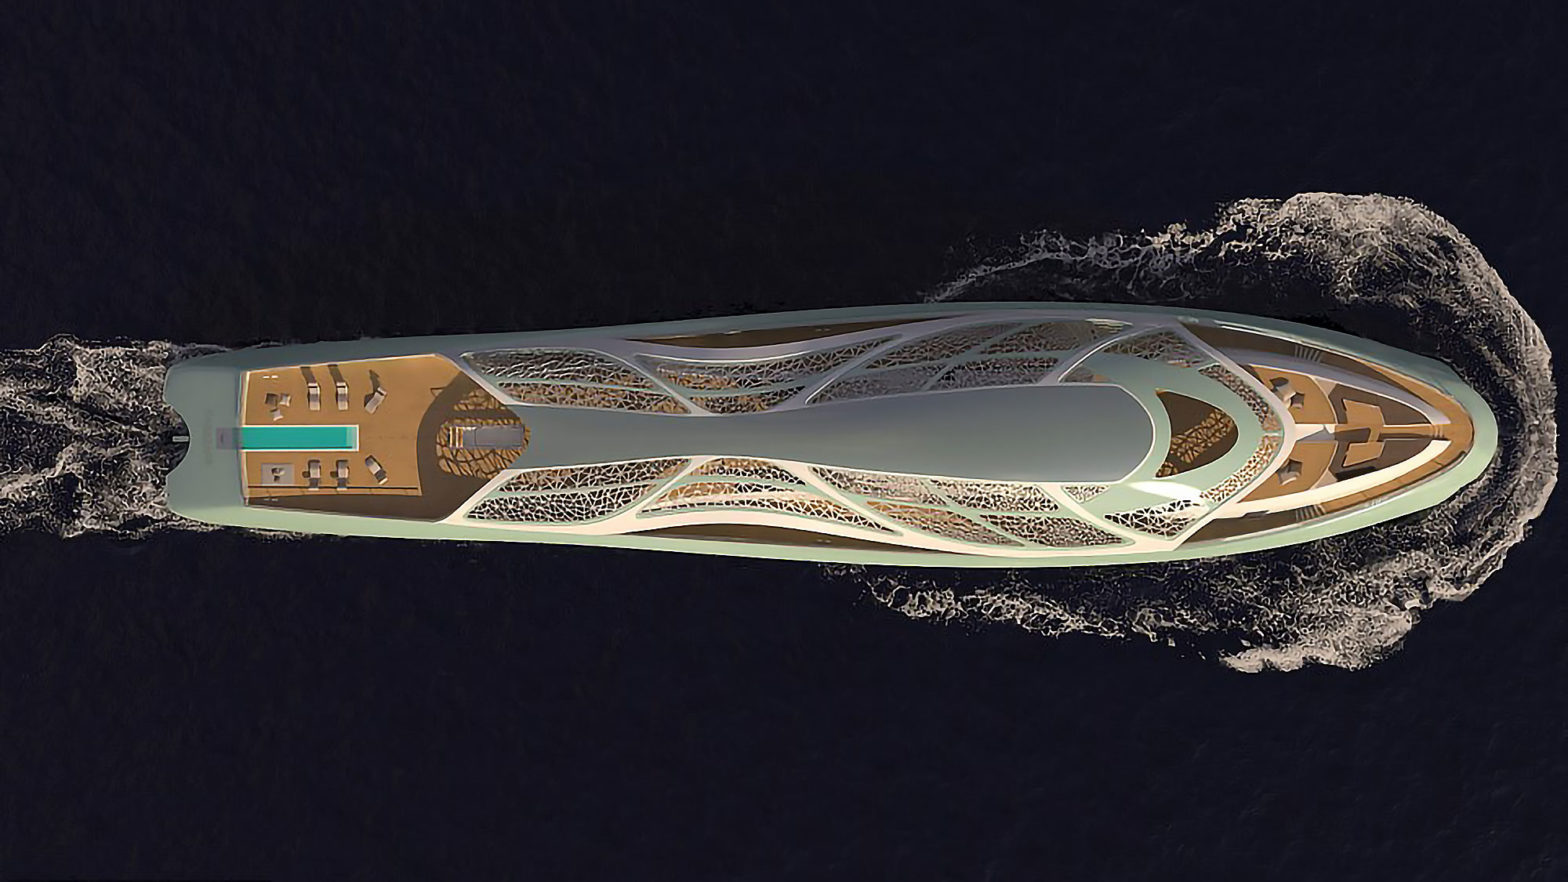 Carapace Superyacht/Submarine Hybrid